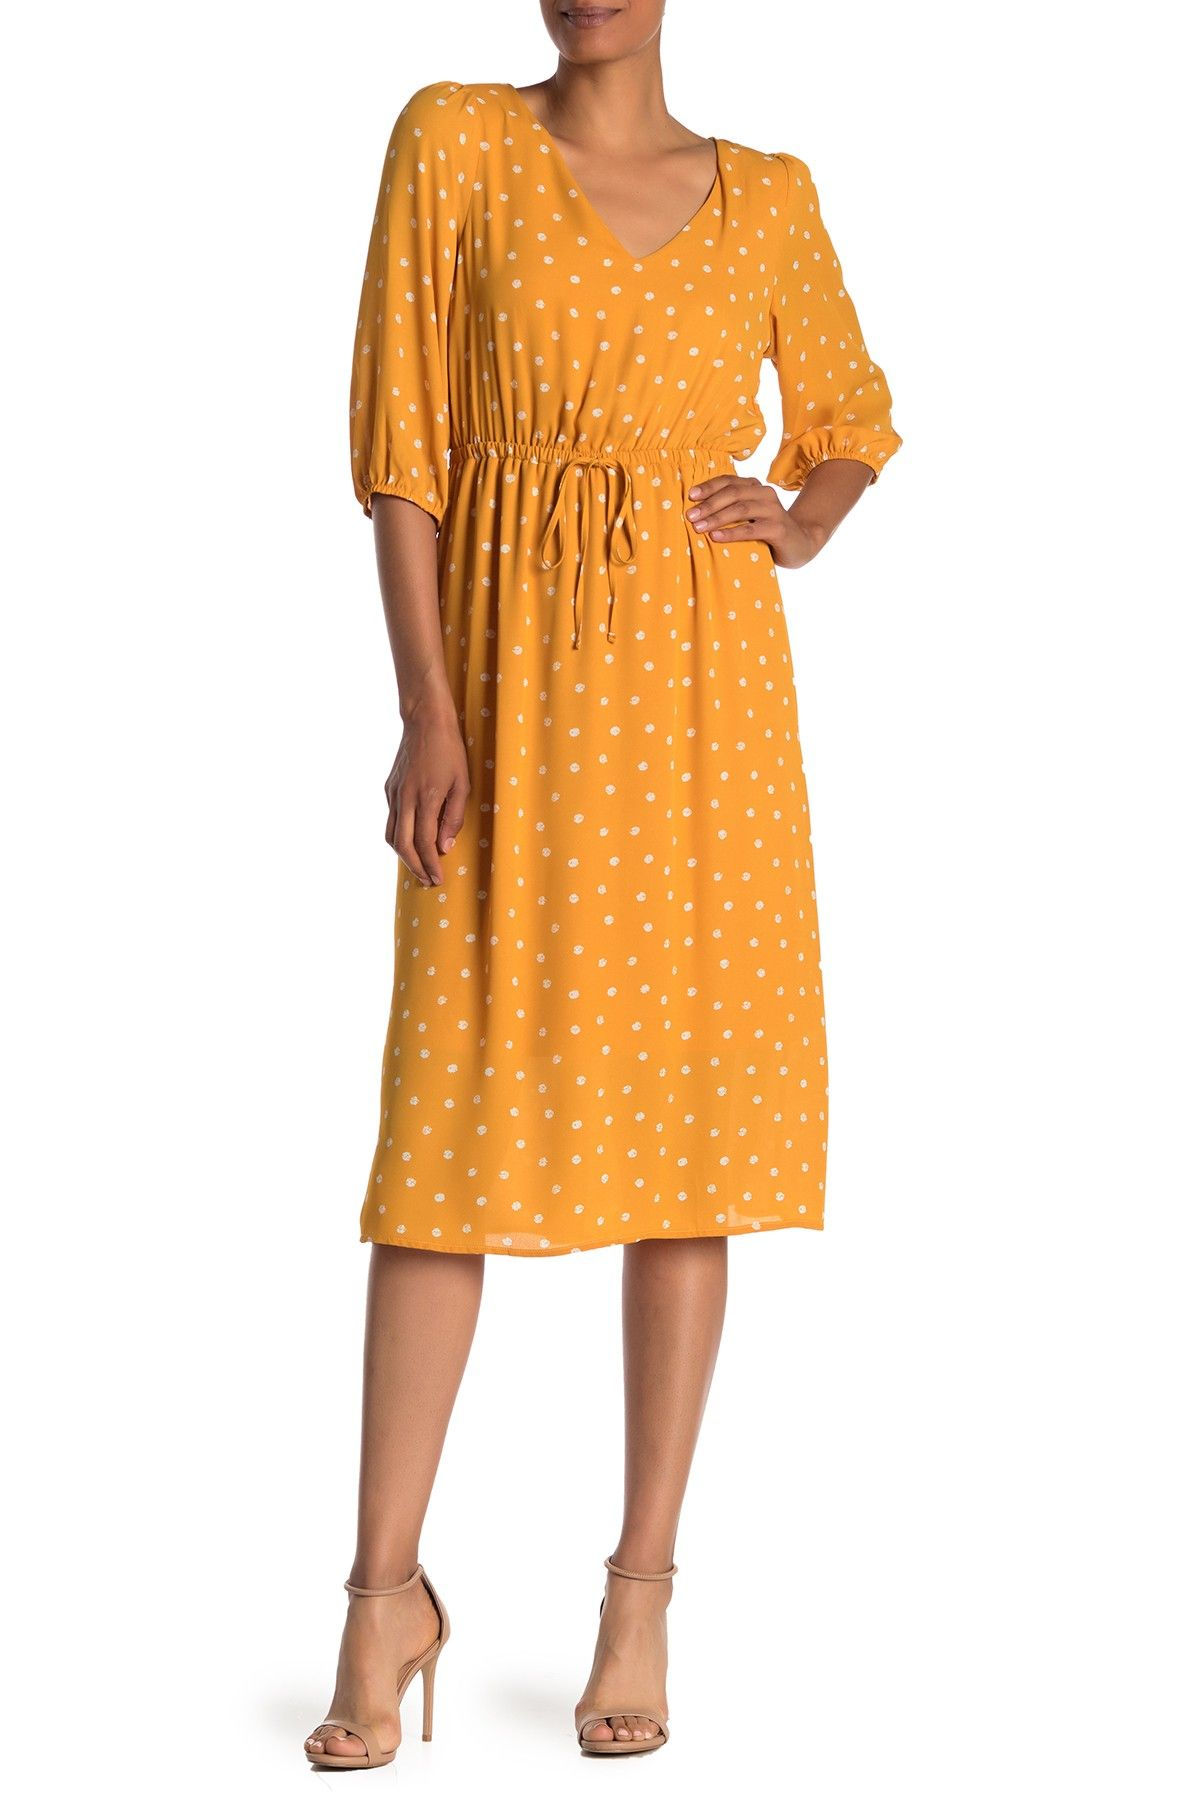 Superfoxx 3 4 Length Sleeve Patterned Midi Dress Nordstrom Rack Patterned Midi Dress Sleeves Pattern Nordstrom Dresses [ 1800 x 1200 Pixel ]